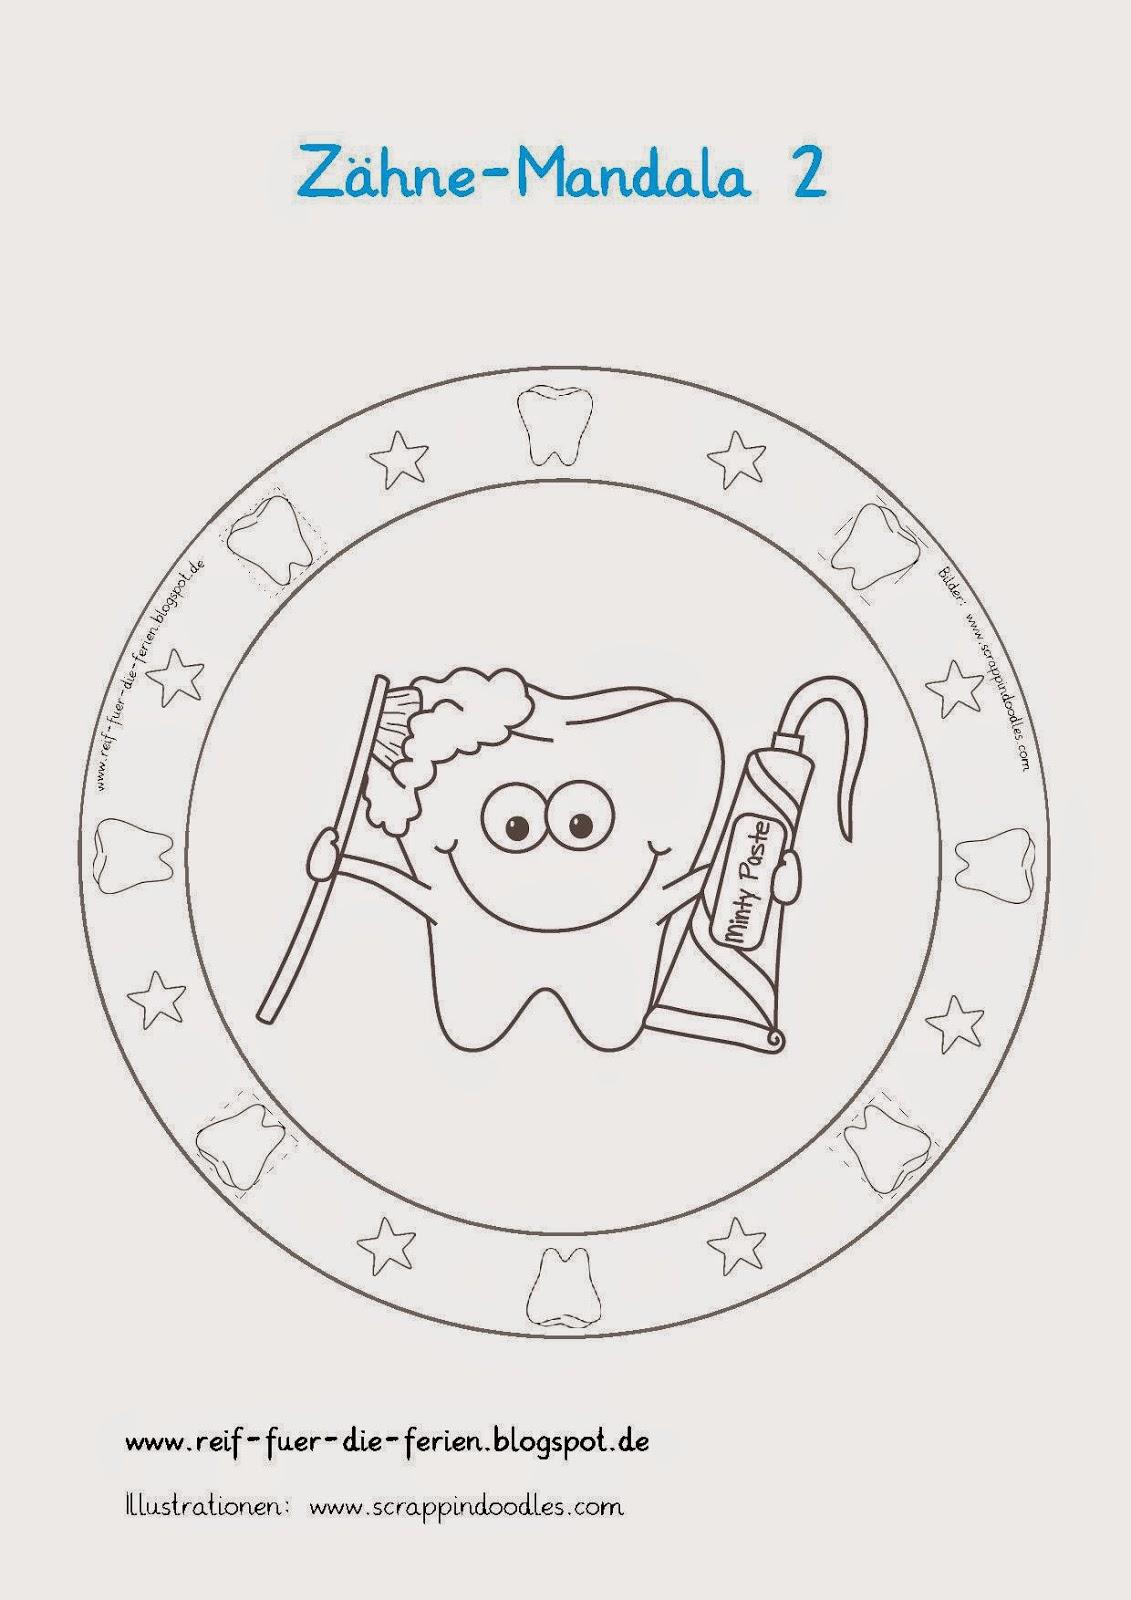 Zähne-Mandalas